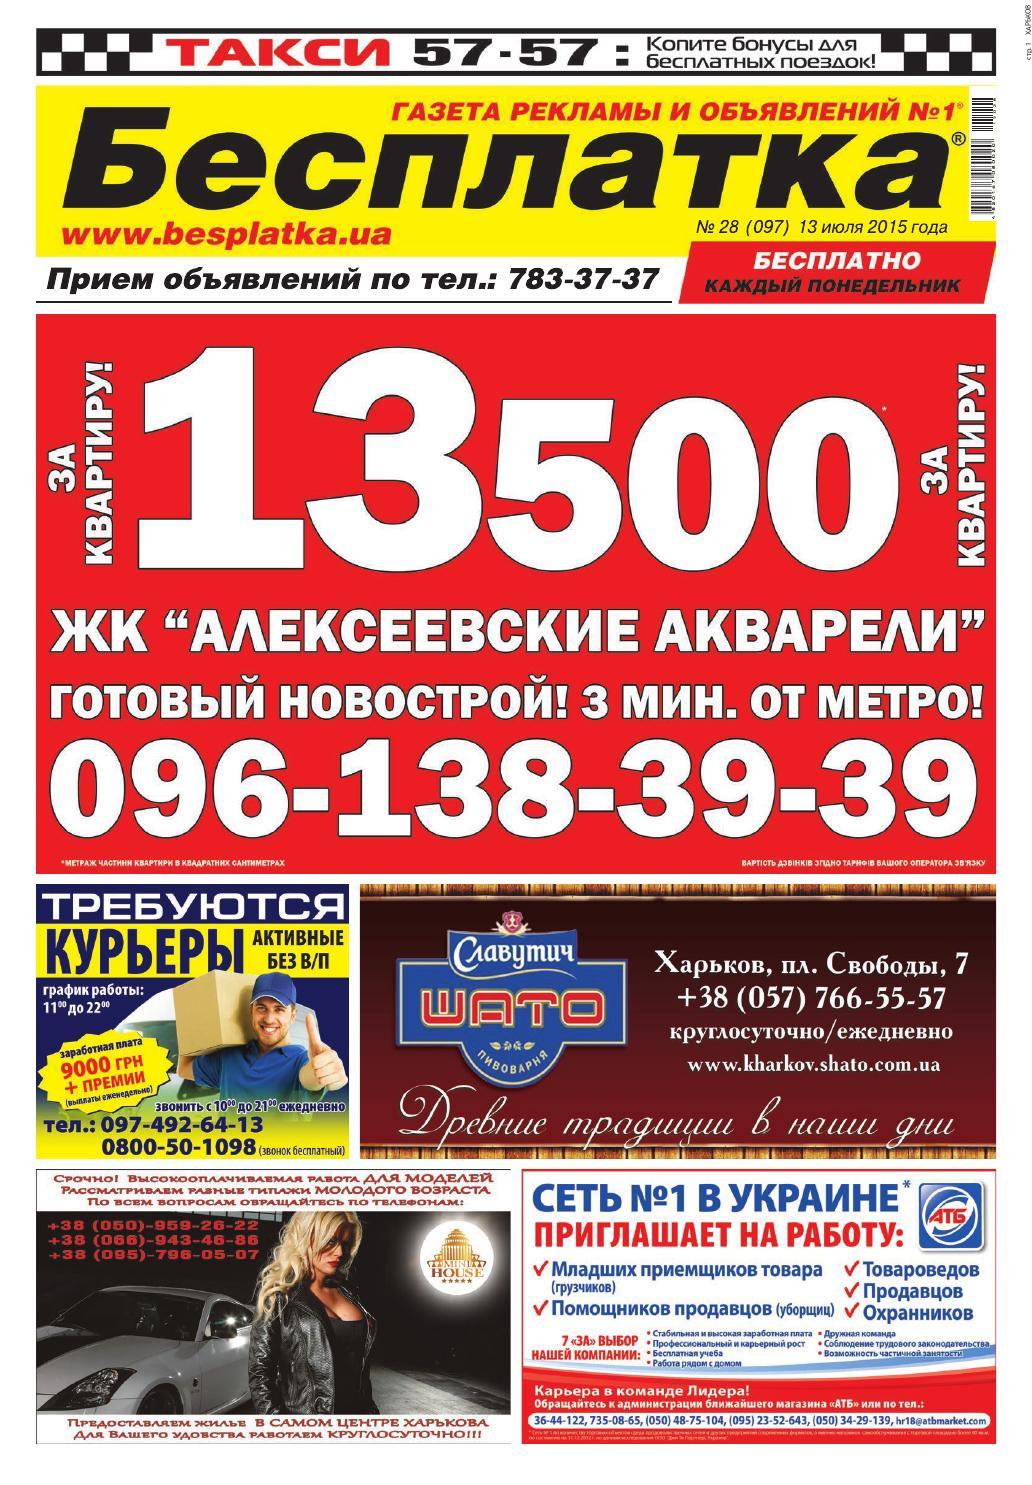 41a9f69e33df Besplatka  28 Харьков by besplatka ukraine - issuu